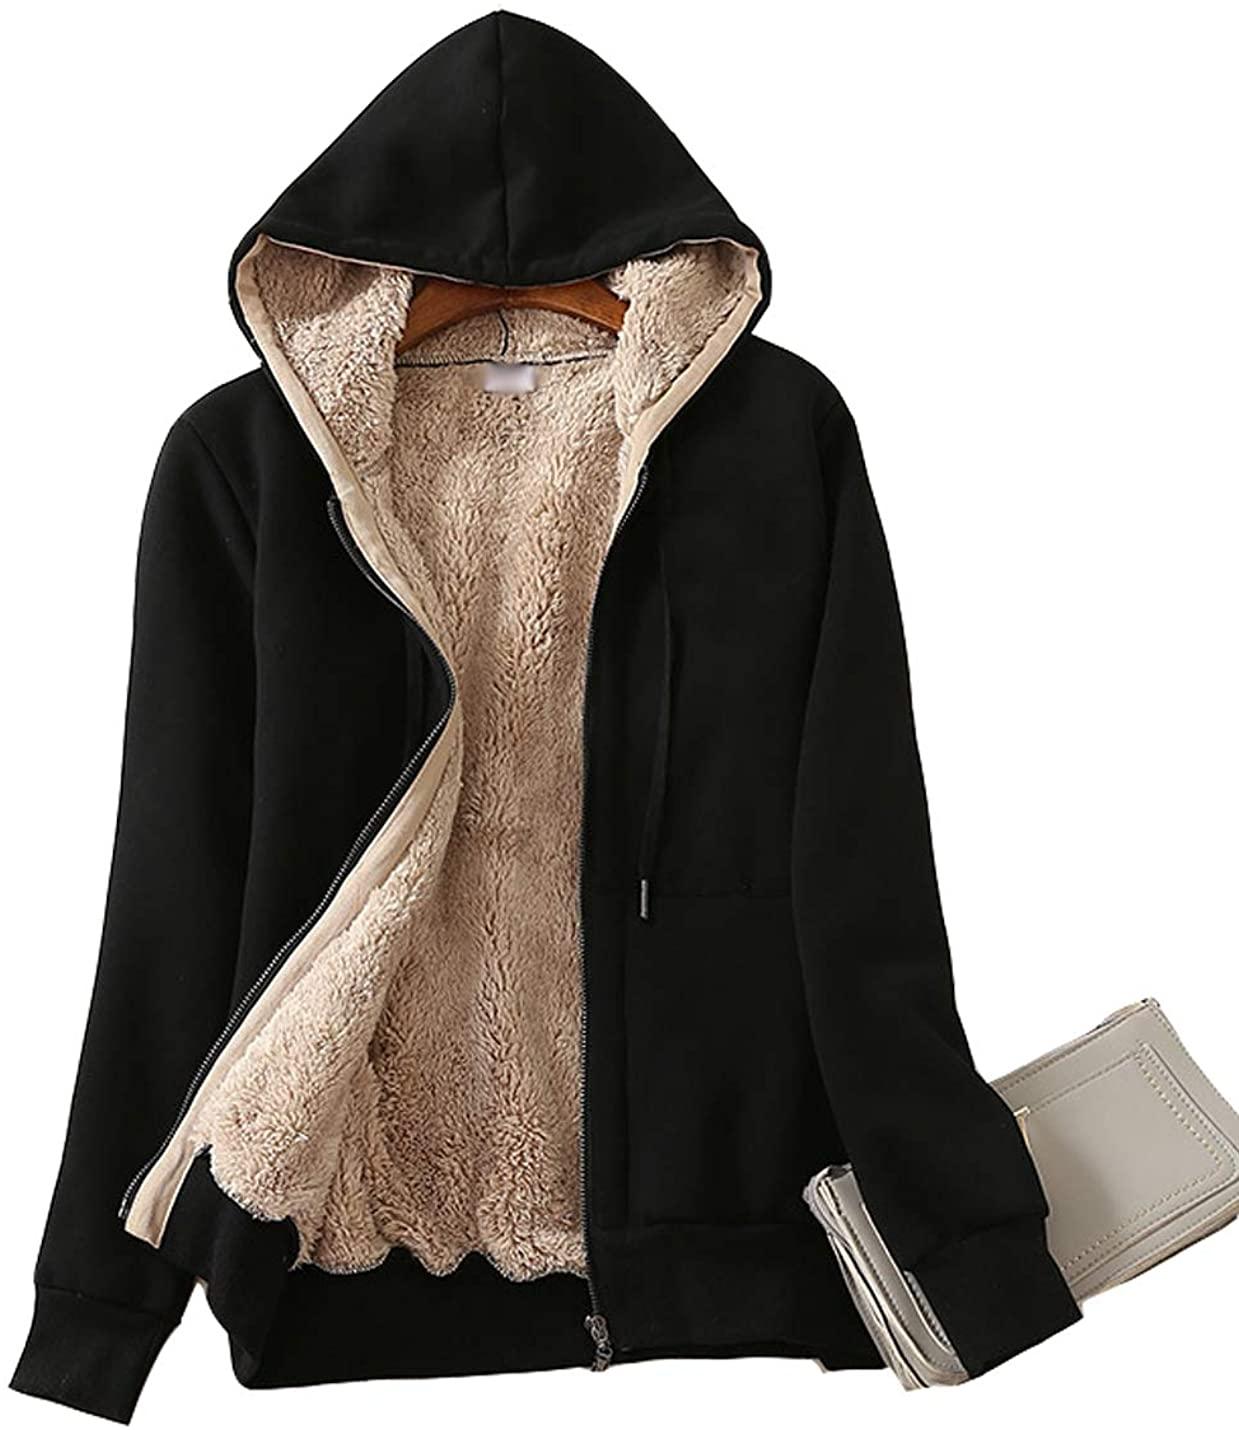 Hongsui Women's Plush Jacket Lamb Cashmere Hooded Sports Jacket Zipper Long Sleeve Winter Jacket